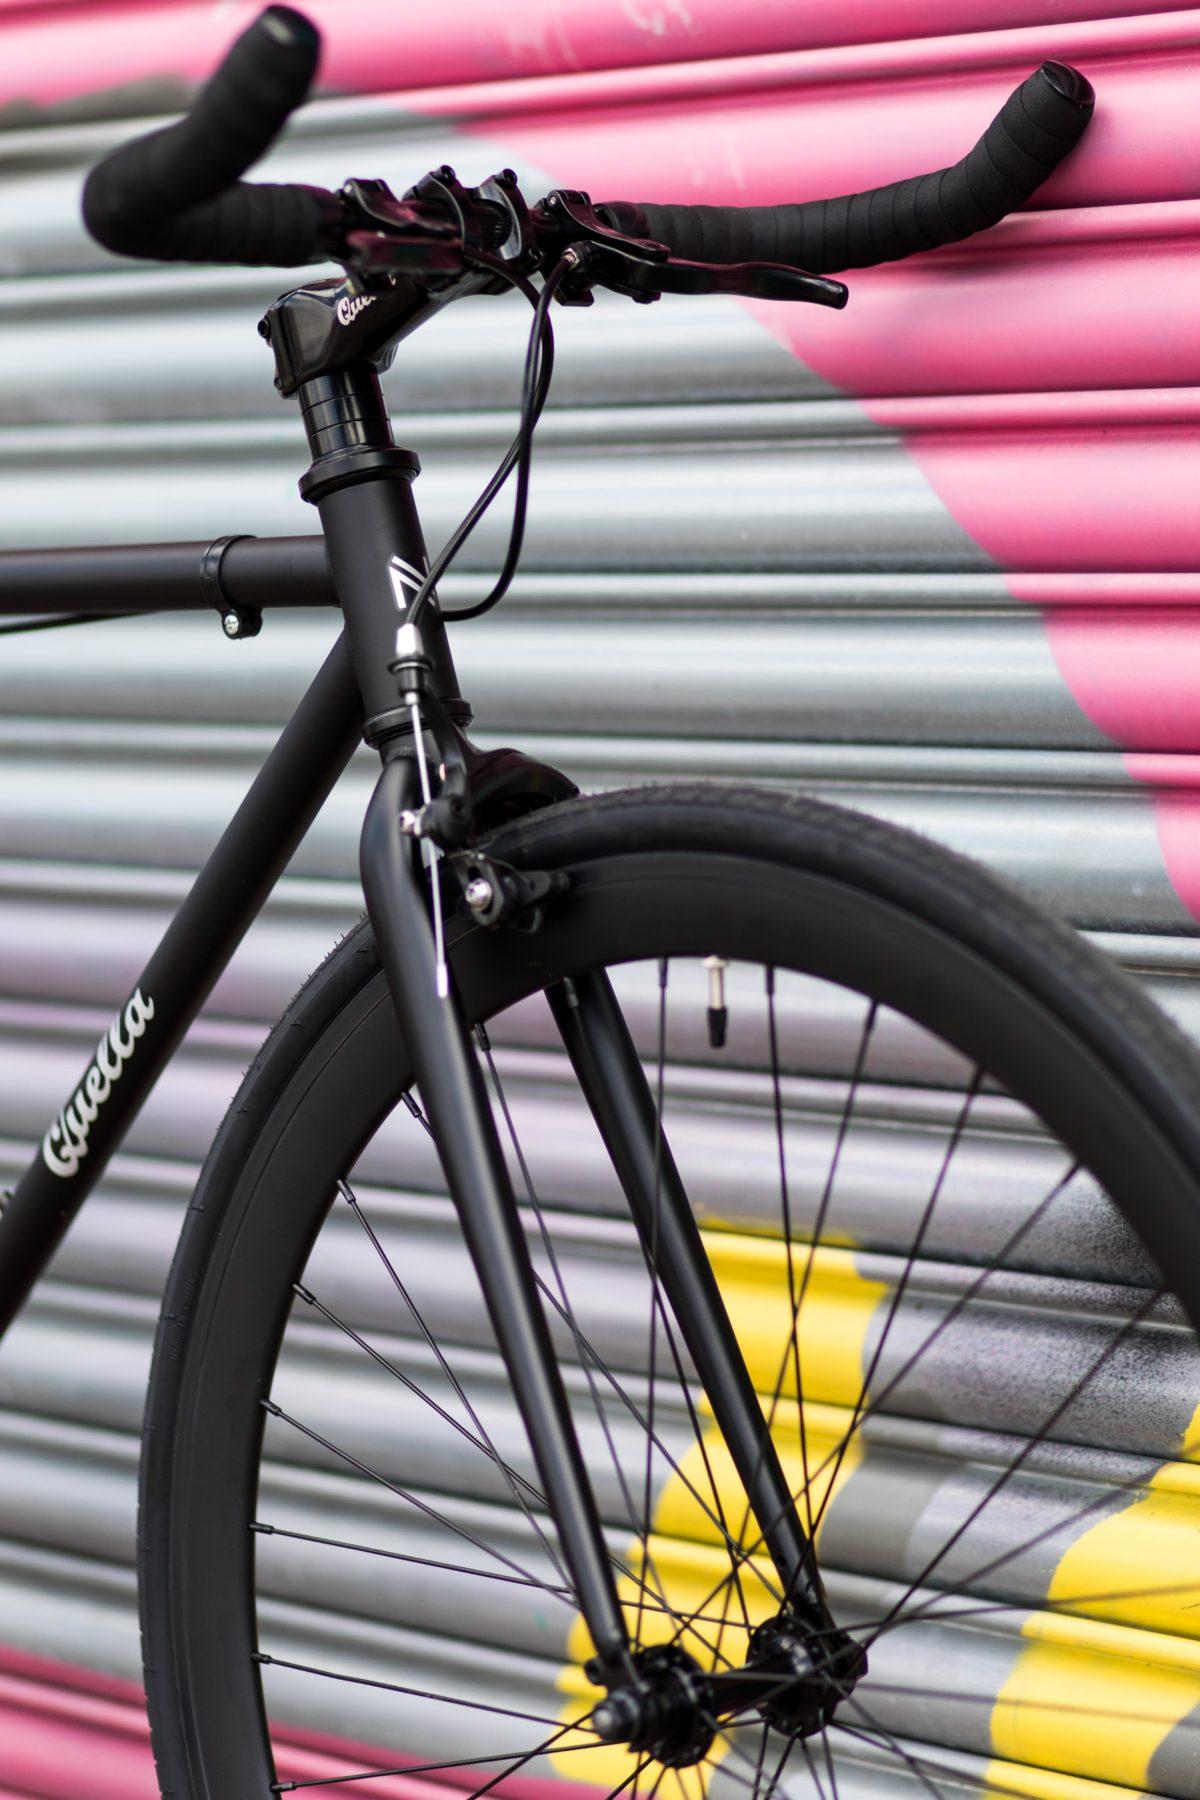 Nero Black SS BikeOnly Urban Cambridge Graffitti – July 2017 (12)